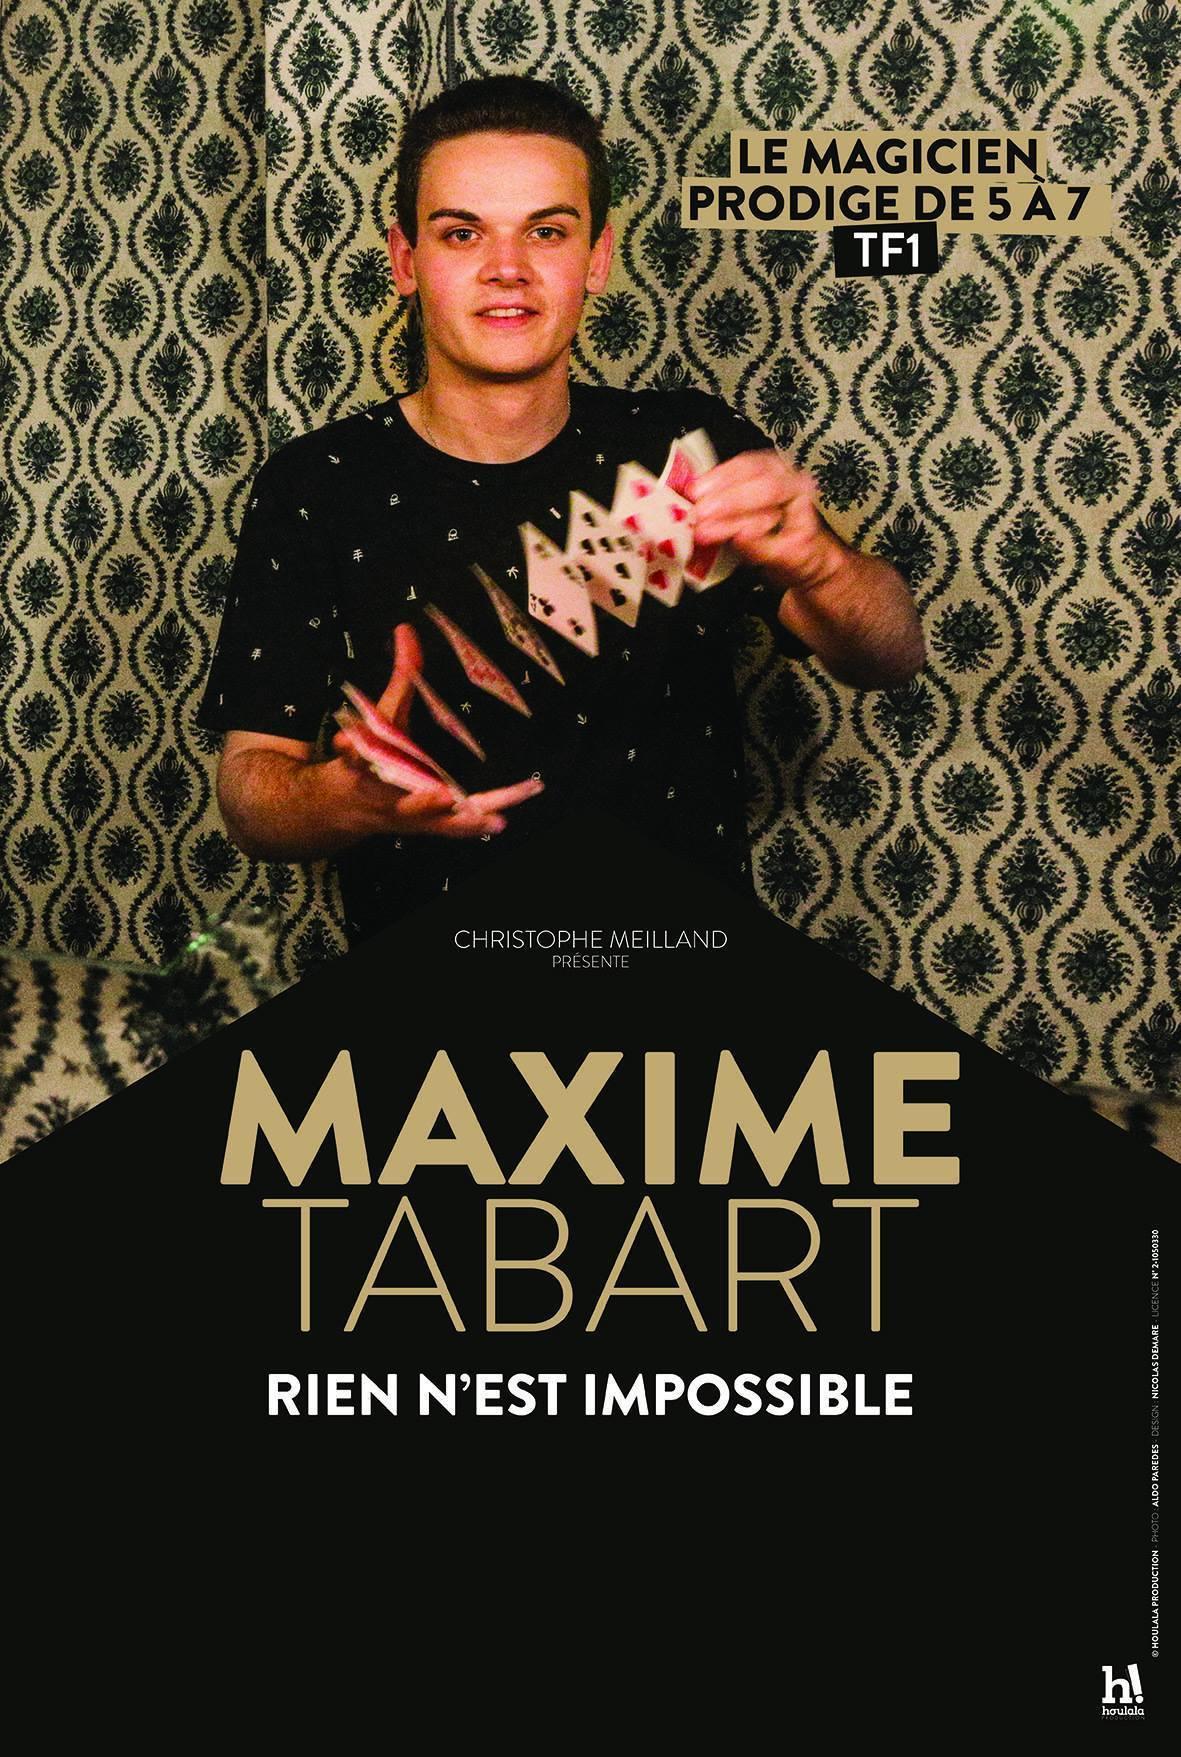 MAXIME TABART - RIEN N'EST IMPOSSIBLE TOULON